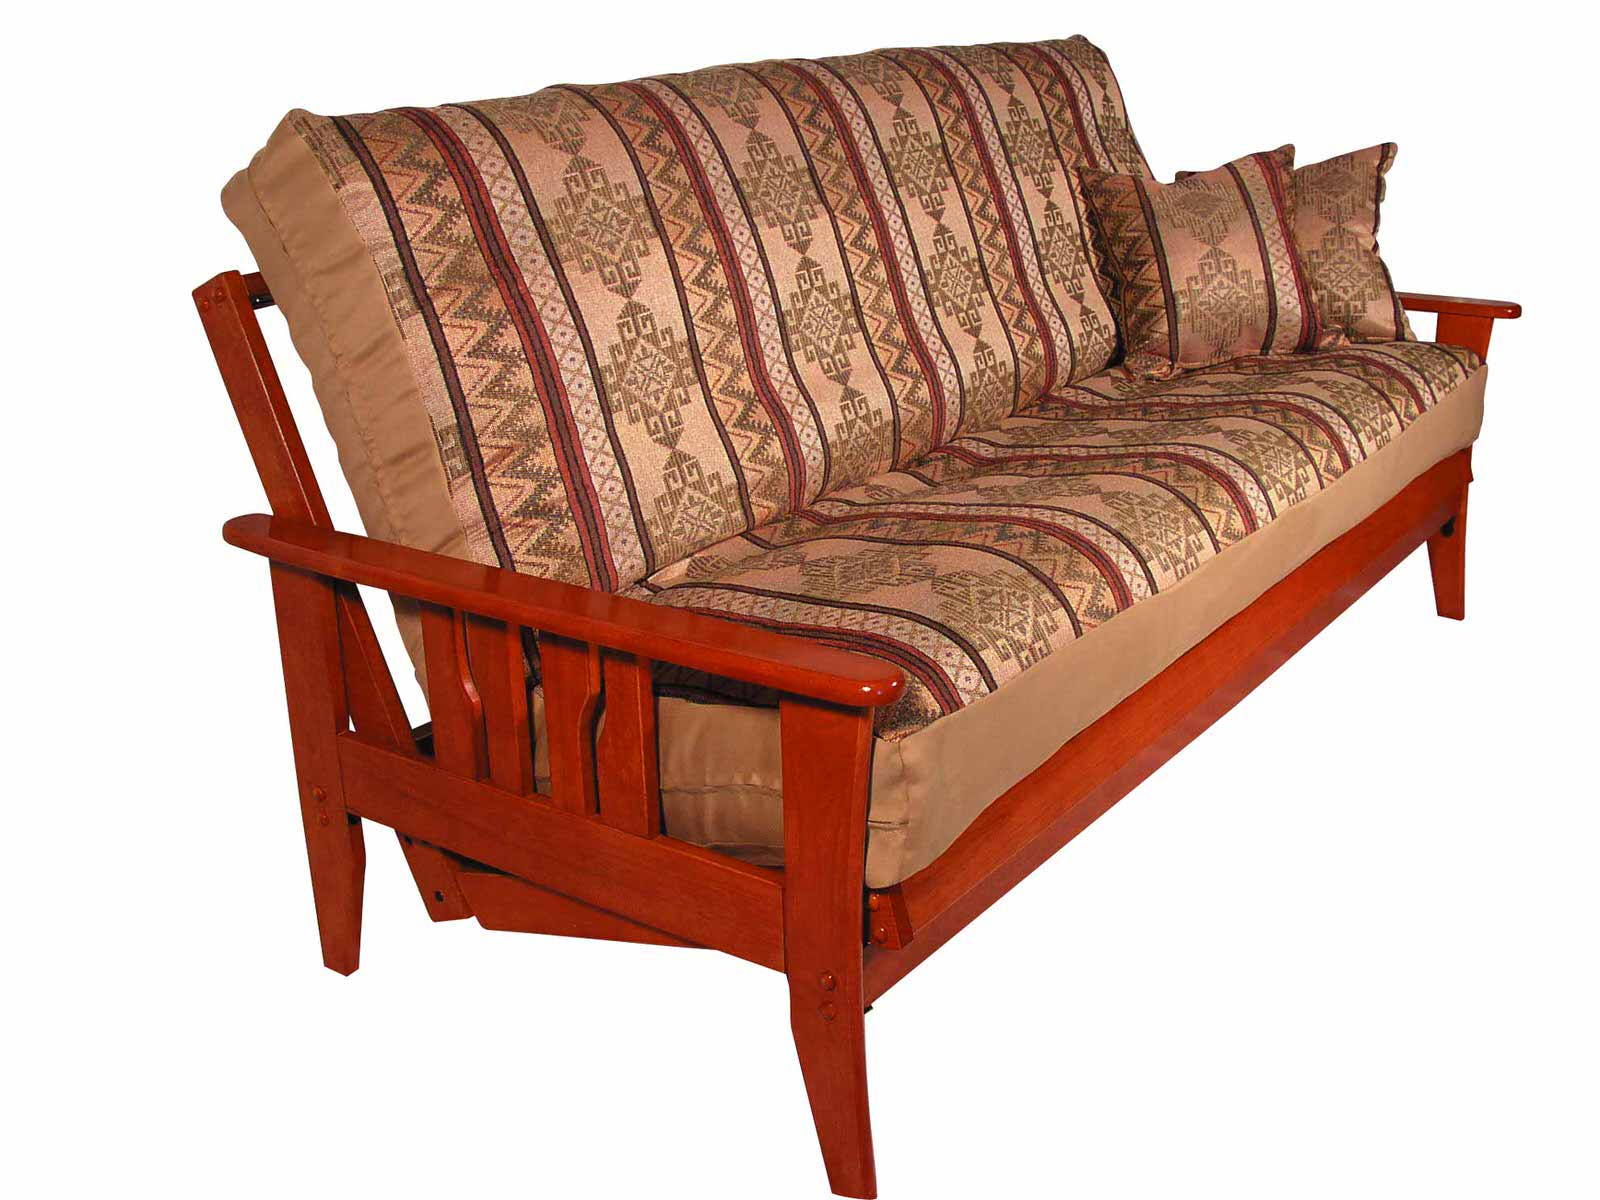 Strange Rina Full Size Natural Futon Set Unemploymentrelief Wooden Chair Designs For Living Room Unemploymentrelieforg